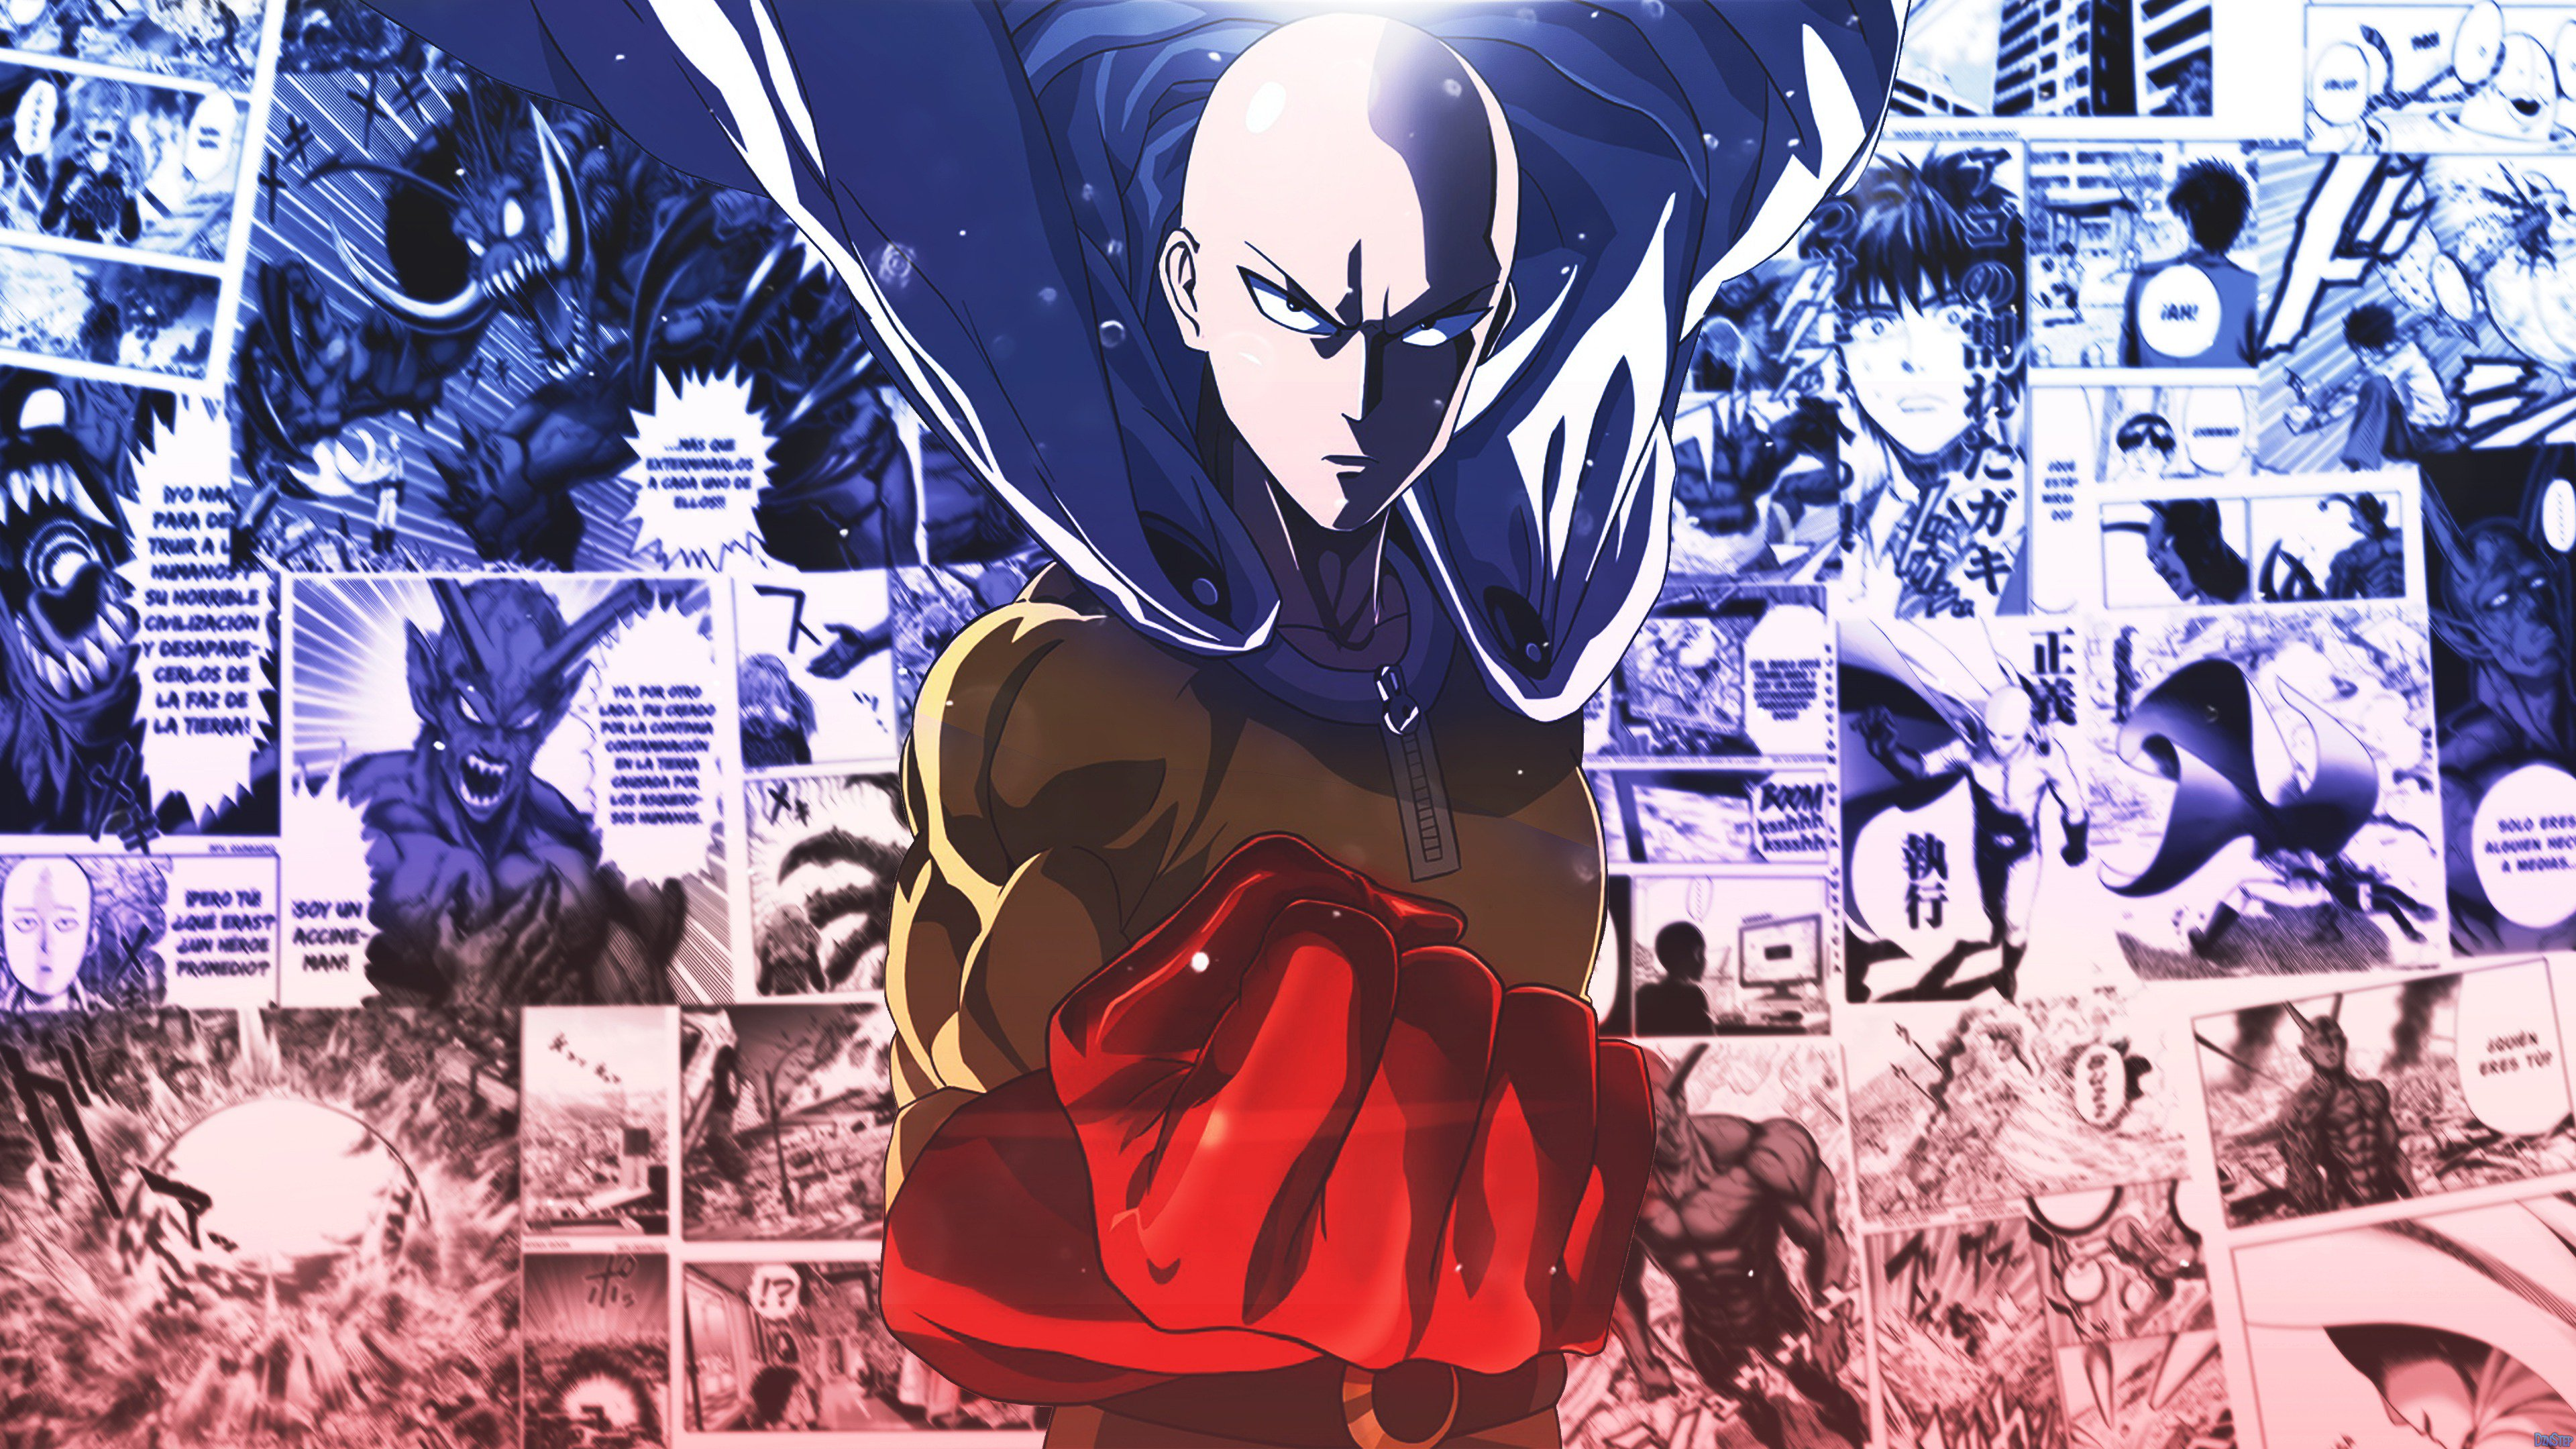 Saitama One Punch Man Anime Wallpaper 4k Ultra Hd Id3218